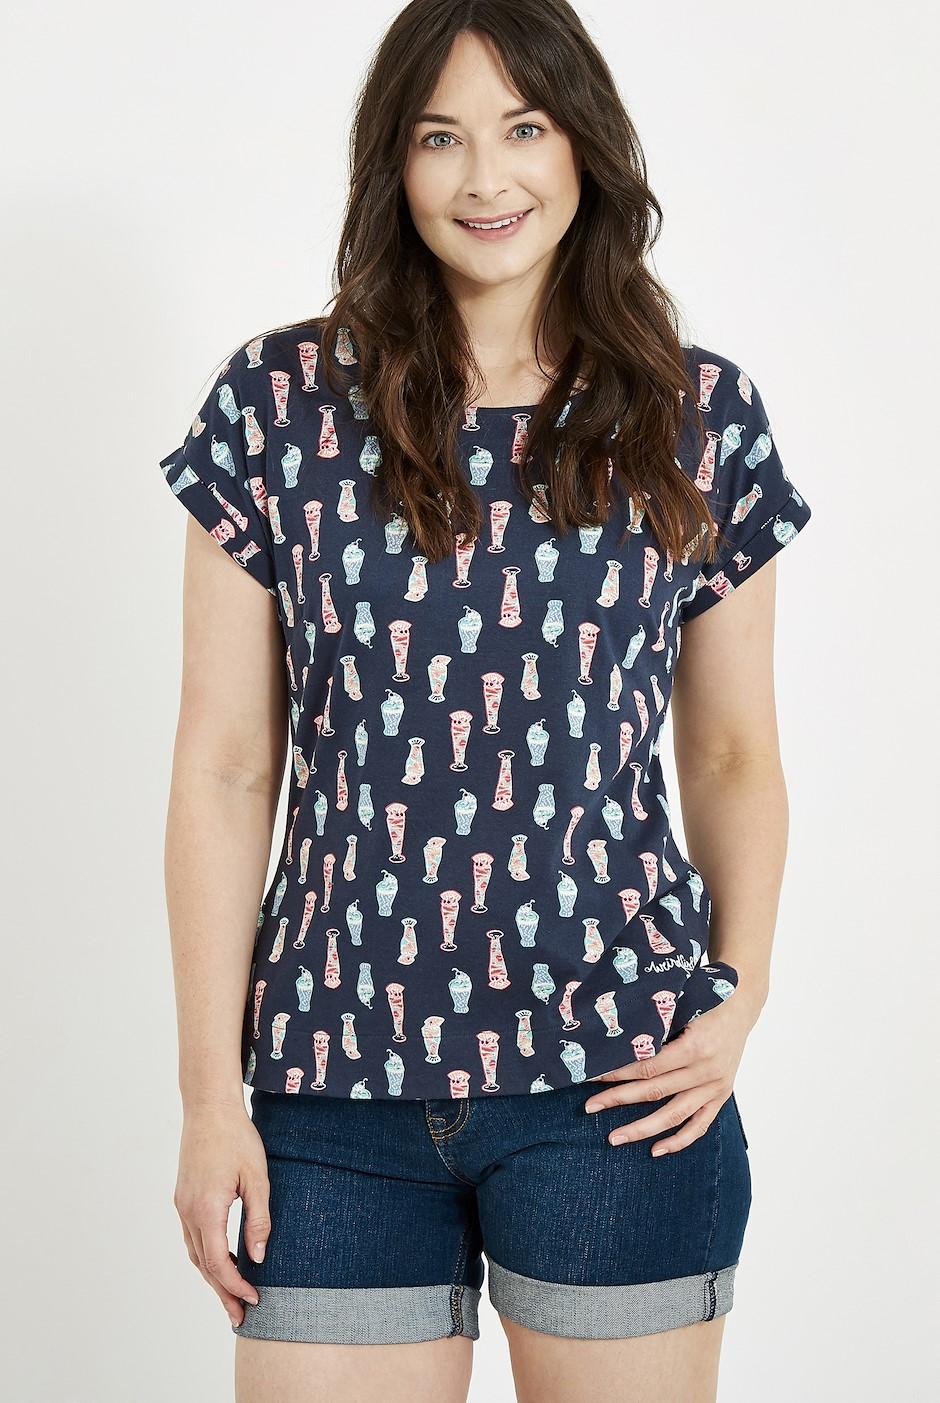 Paw Paw Printed Jersey T-Shirt Navy Blue